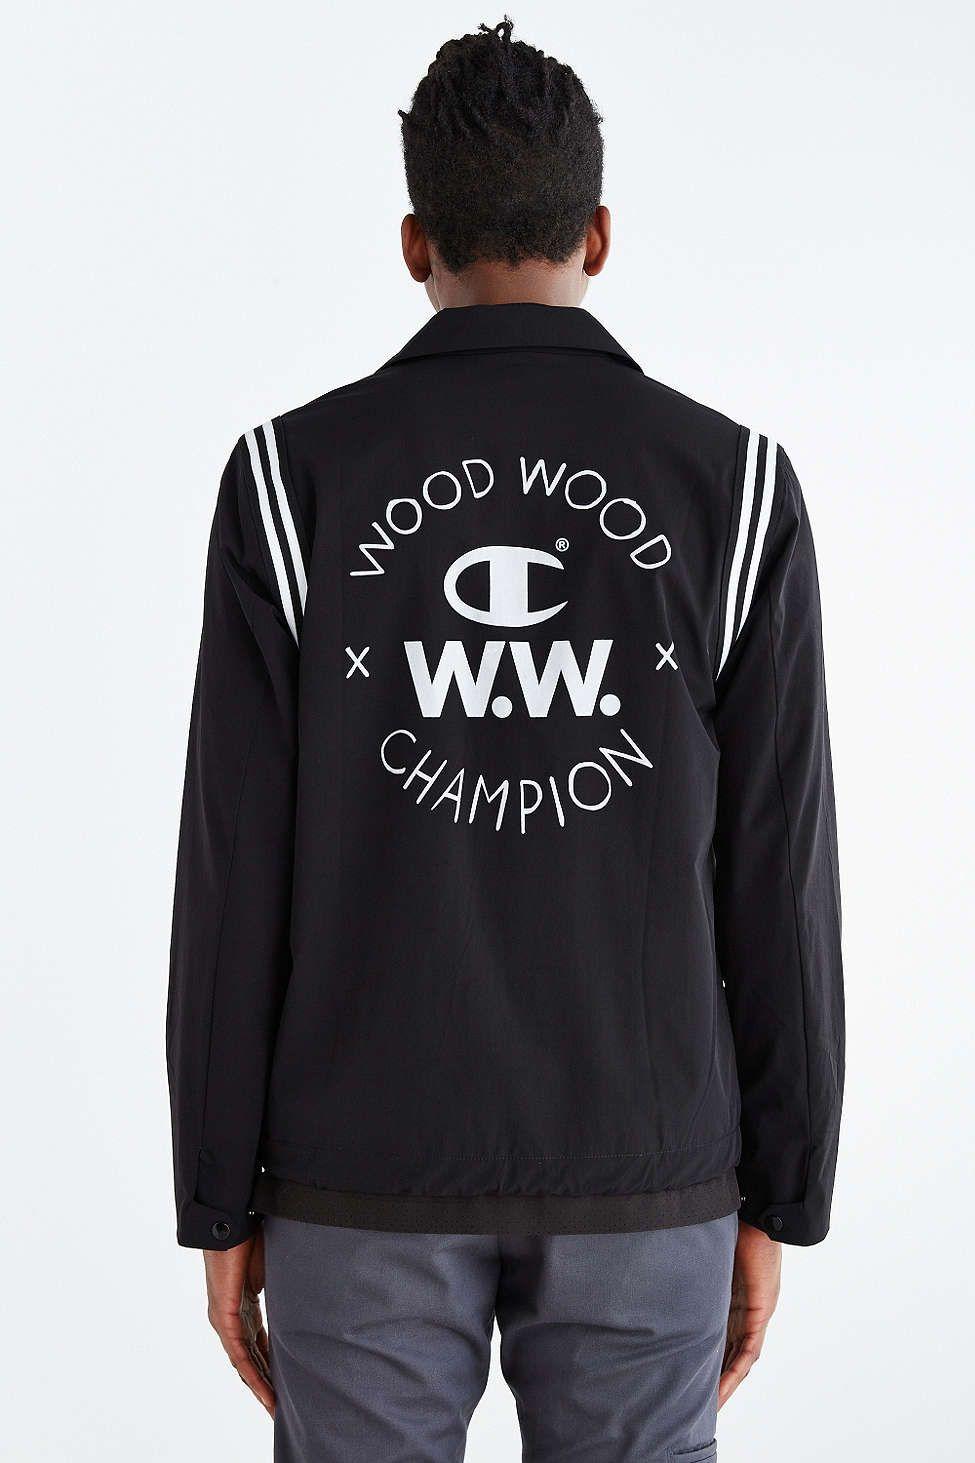 Champion X Wood Wood Coach Jacket   Påklædning   Jackets, Urban ... 103954770e